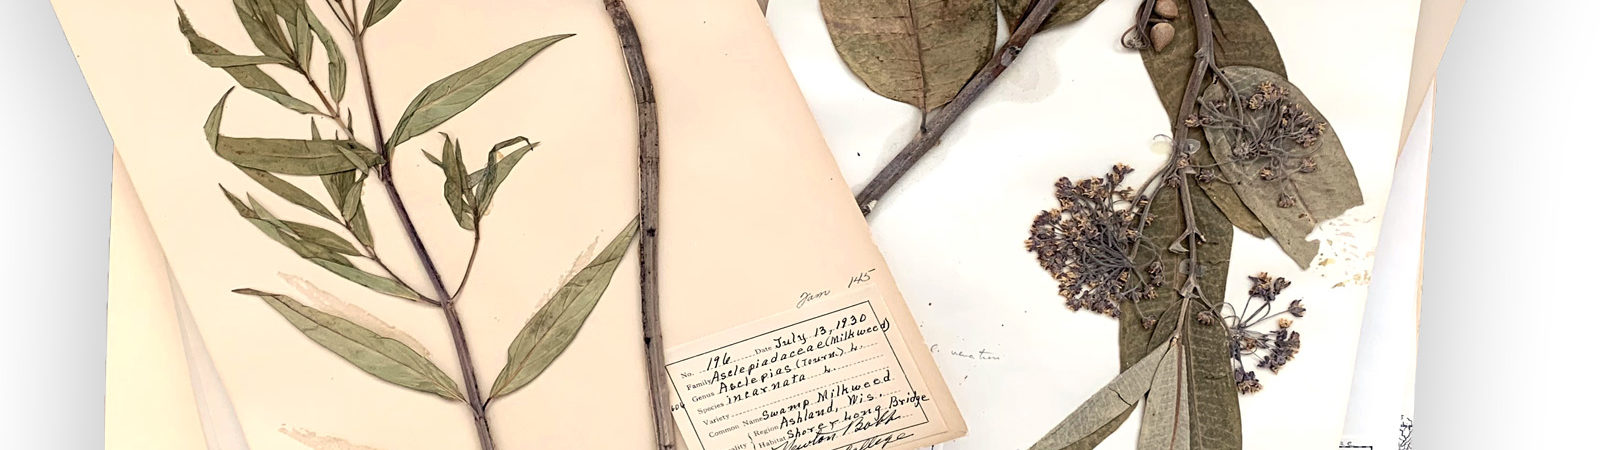 photo of Newton Bobb's plant specimens